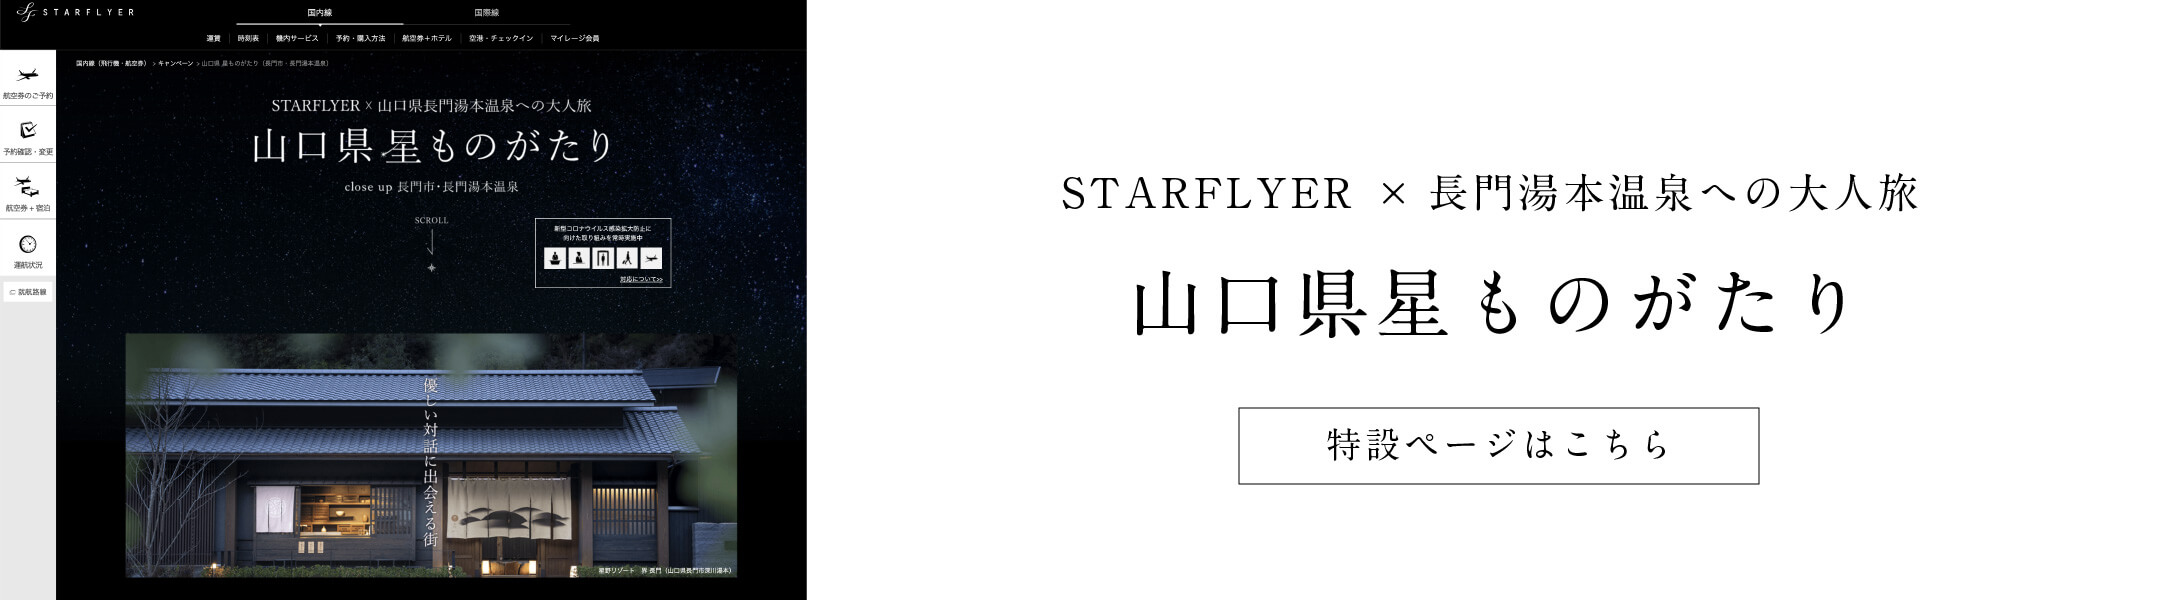 starflyer&長門湯本温泉